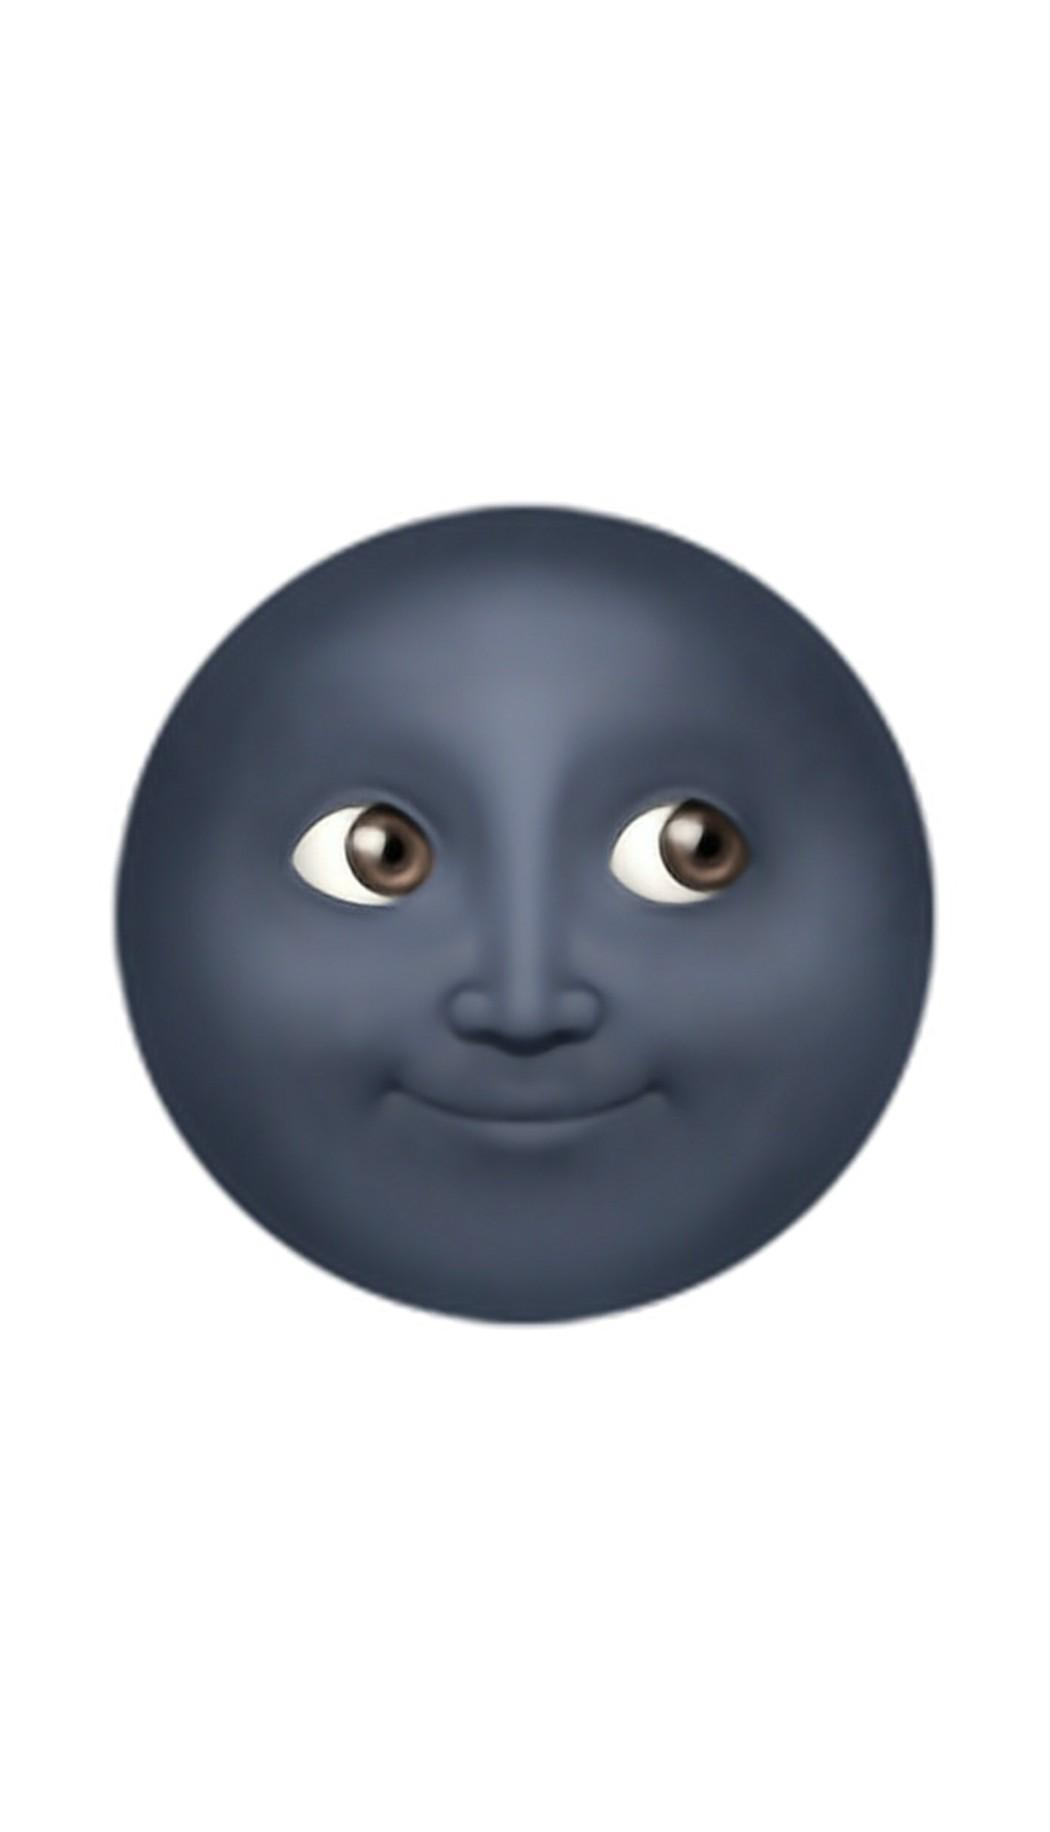 Arti Emoji Bulan Gosong